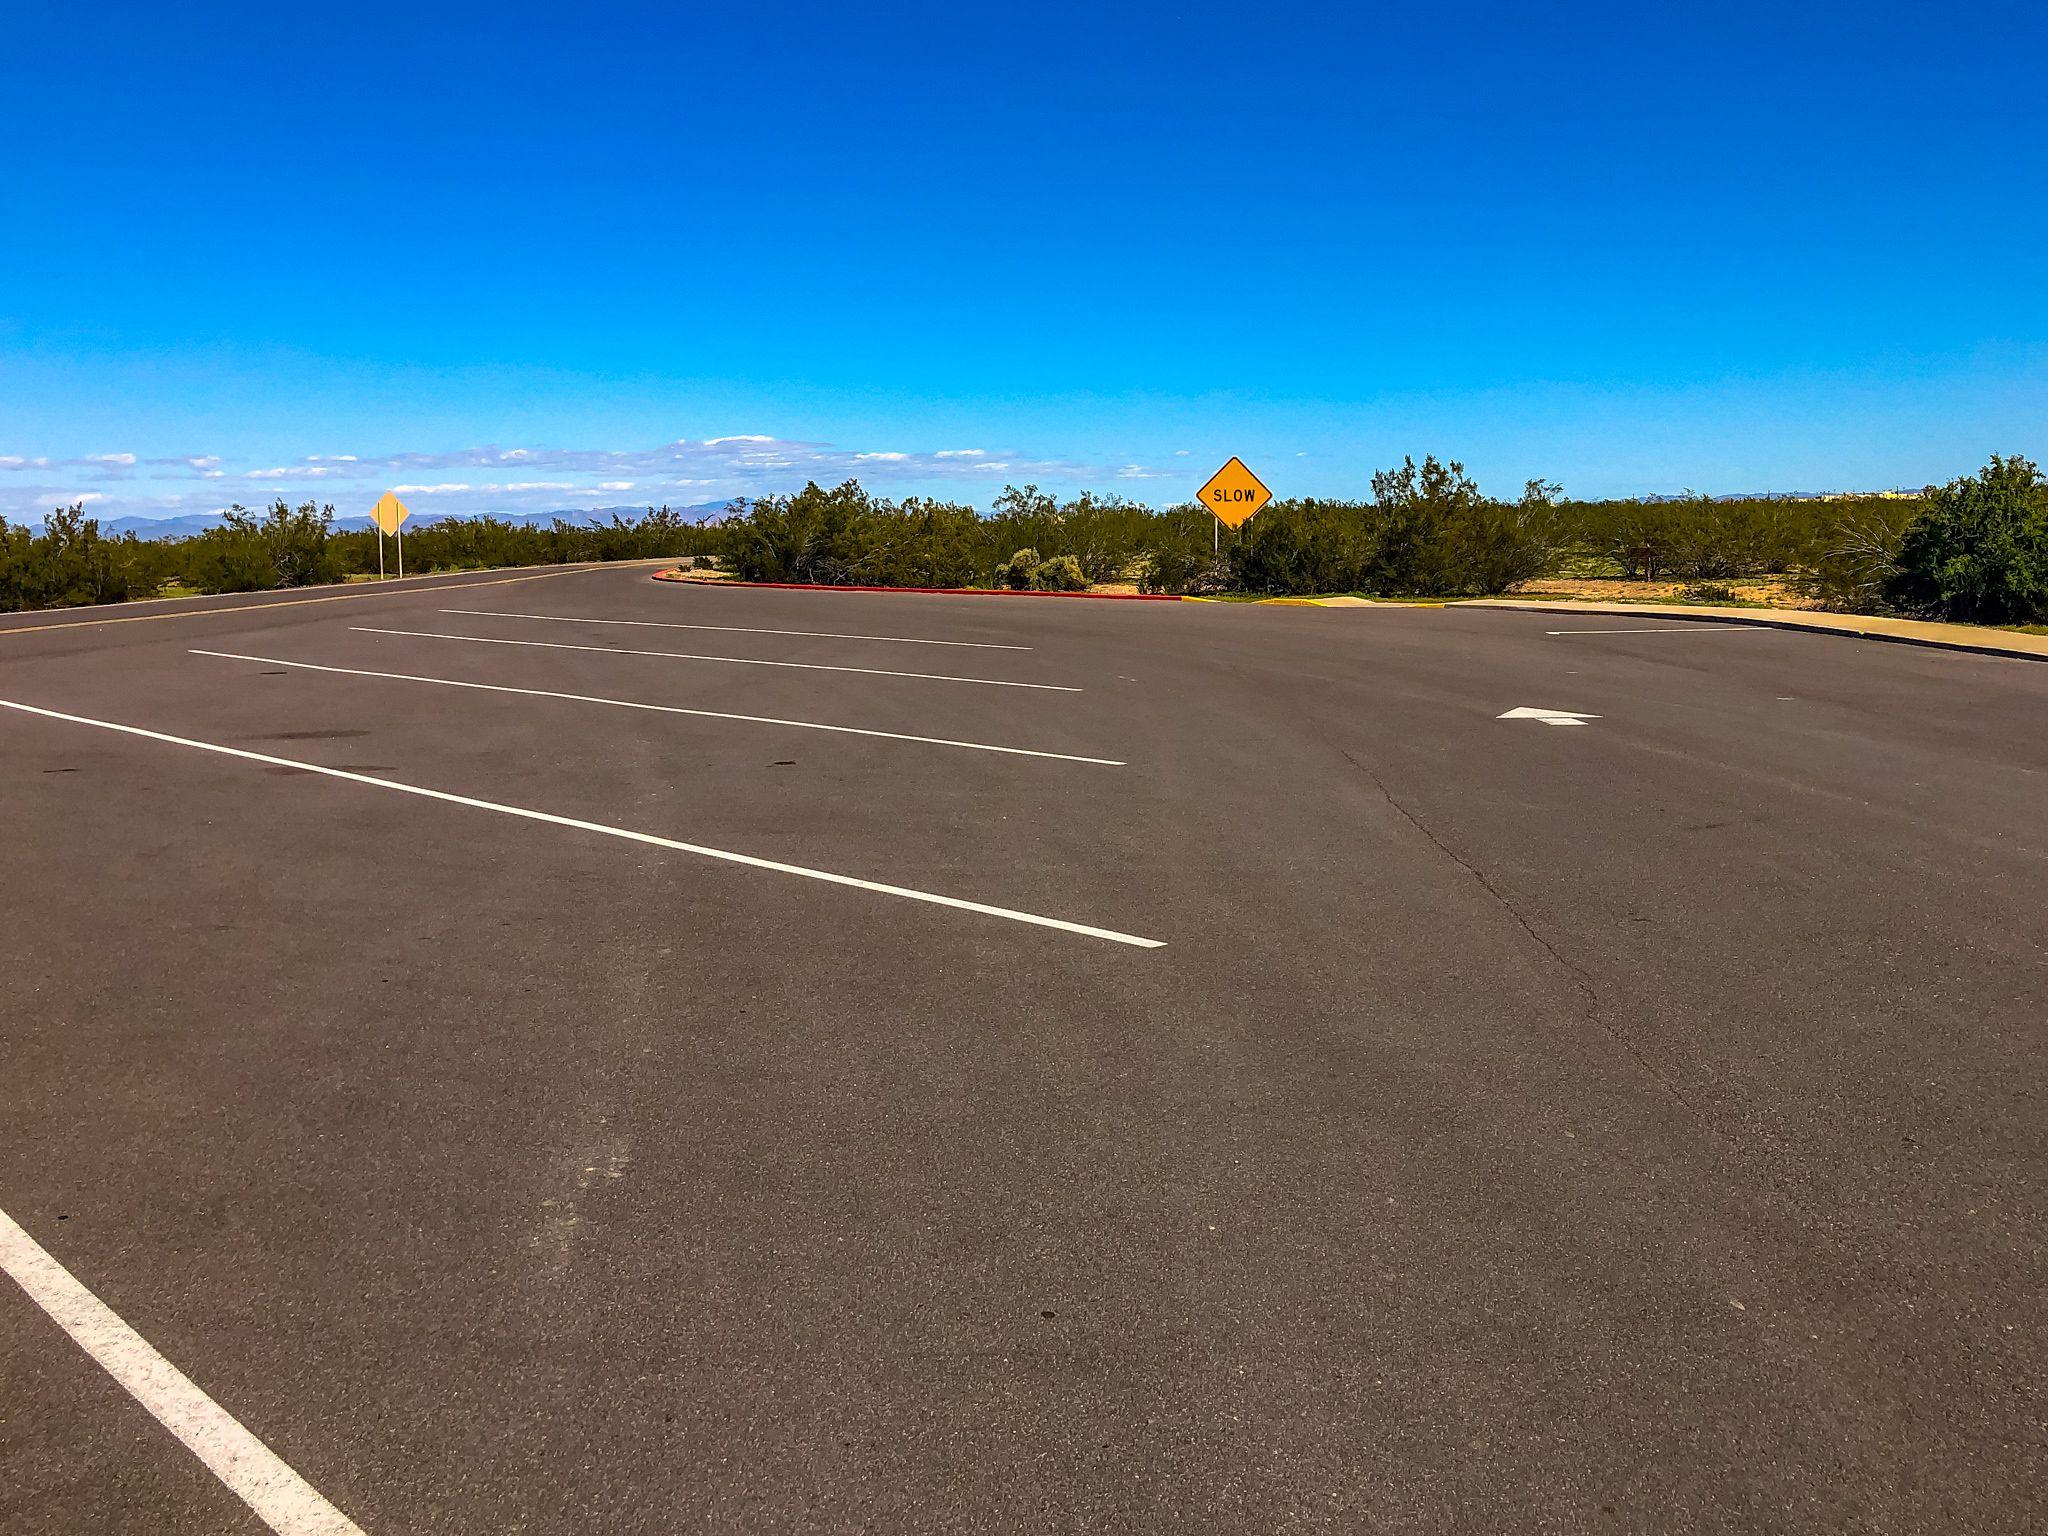 RV Parking at Casa Grande Ruins NM